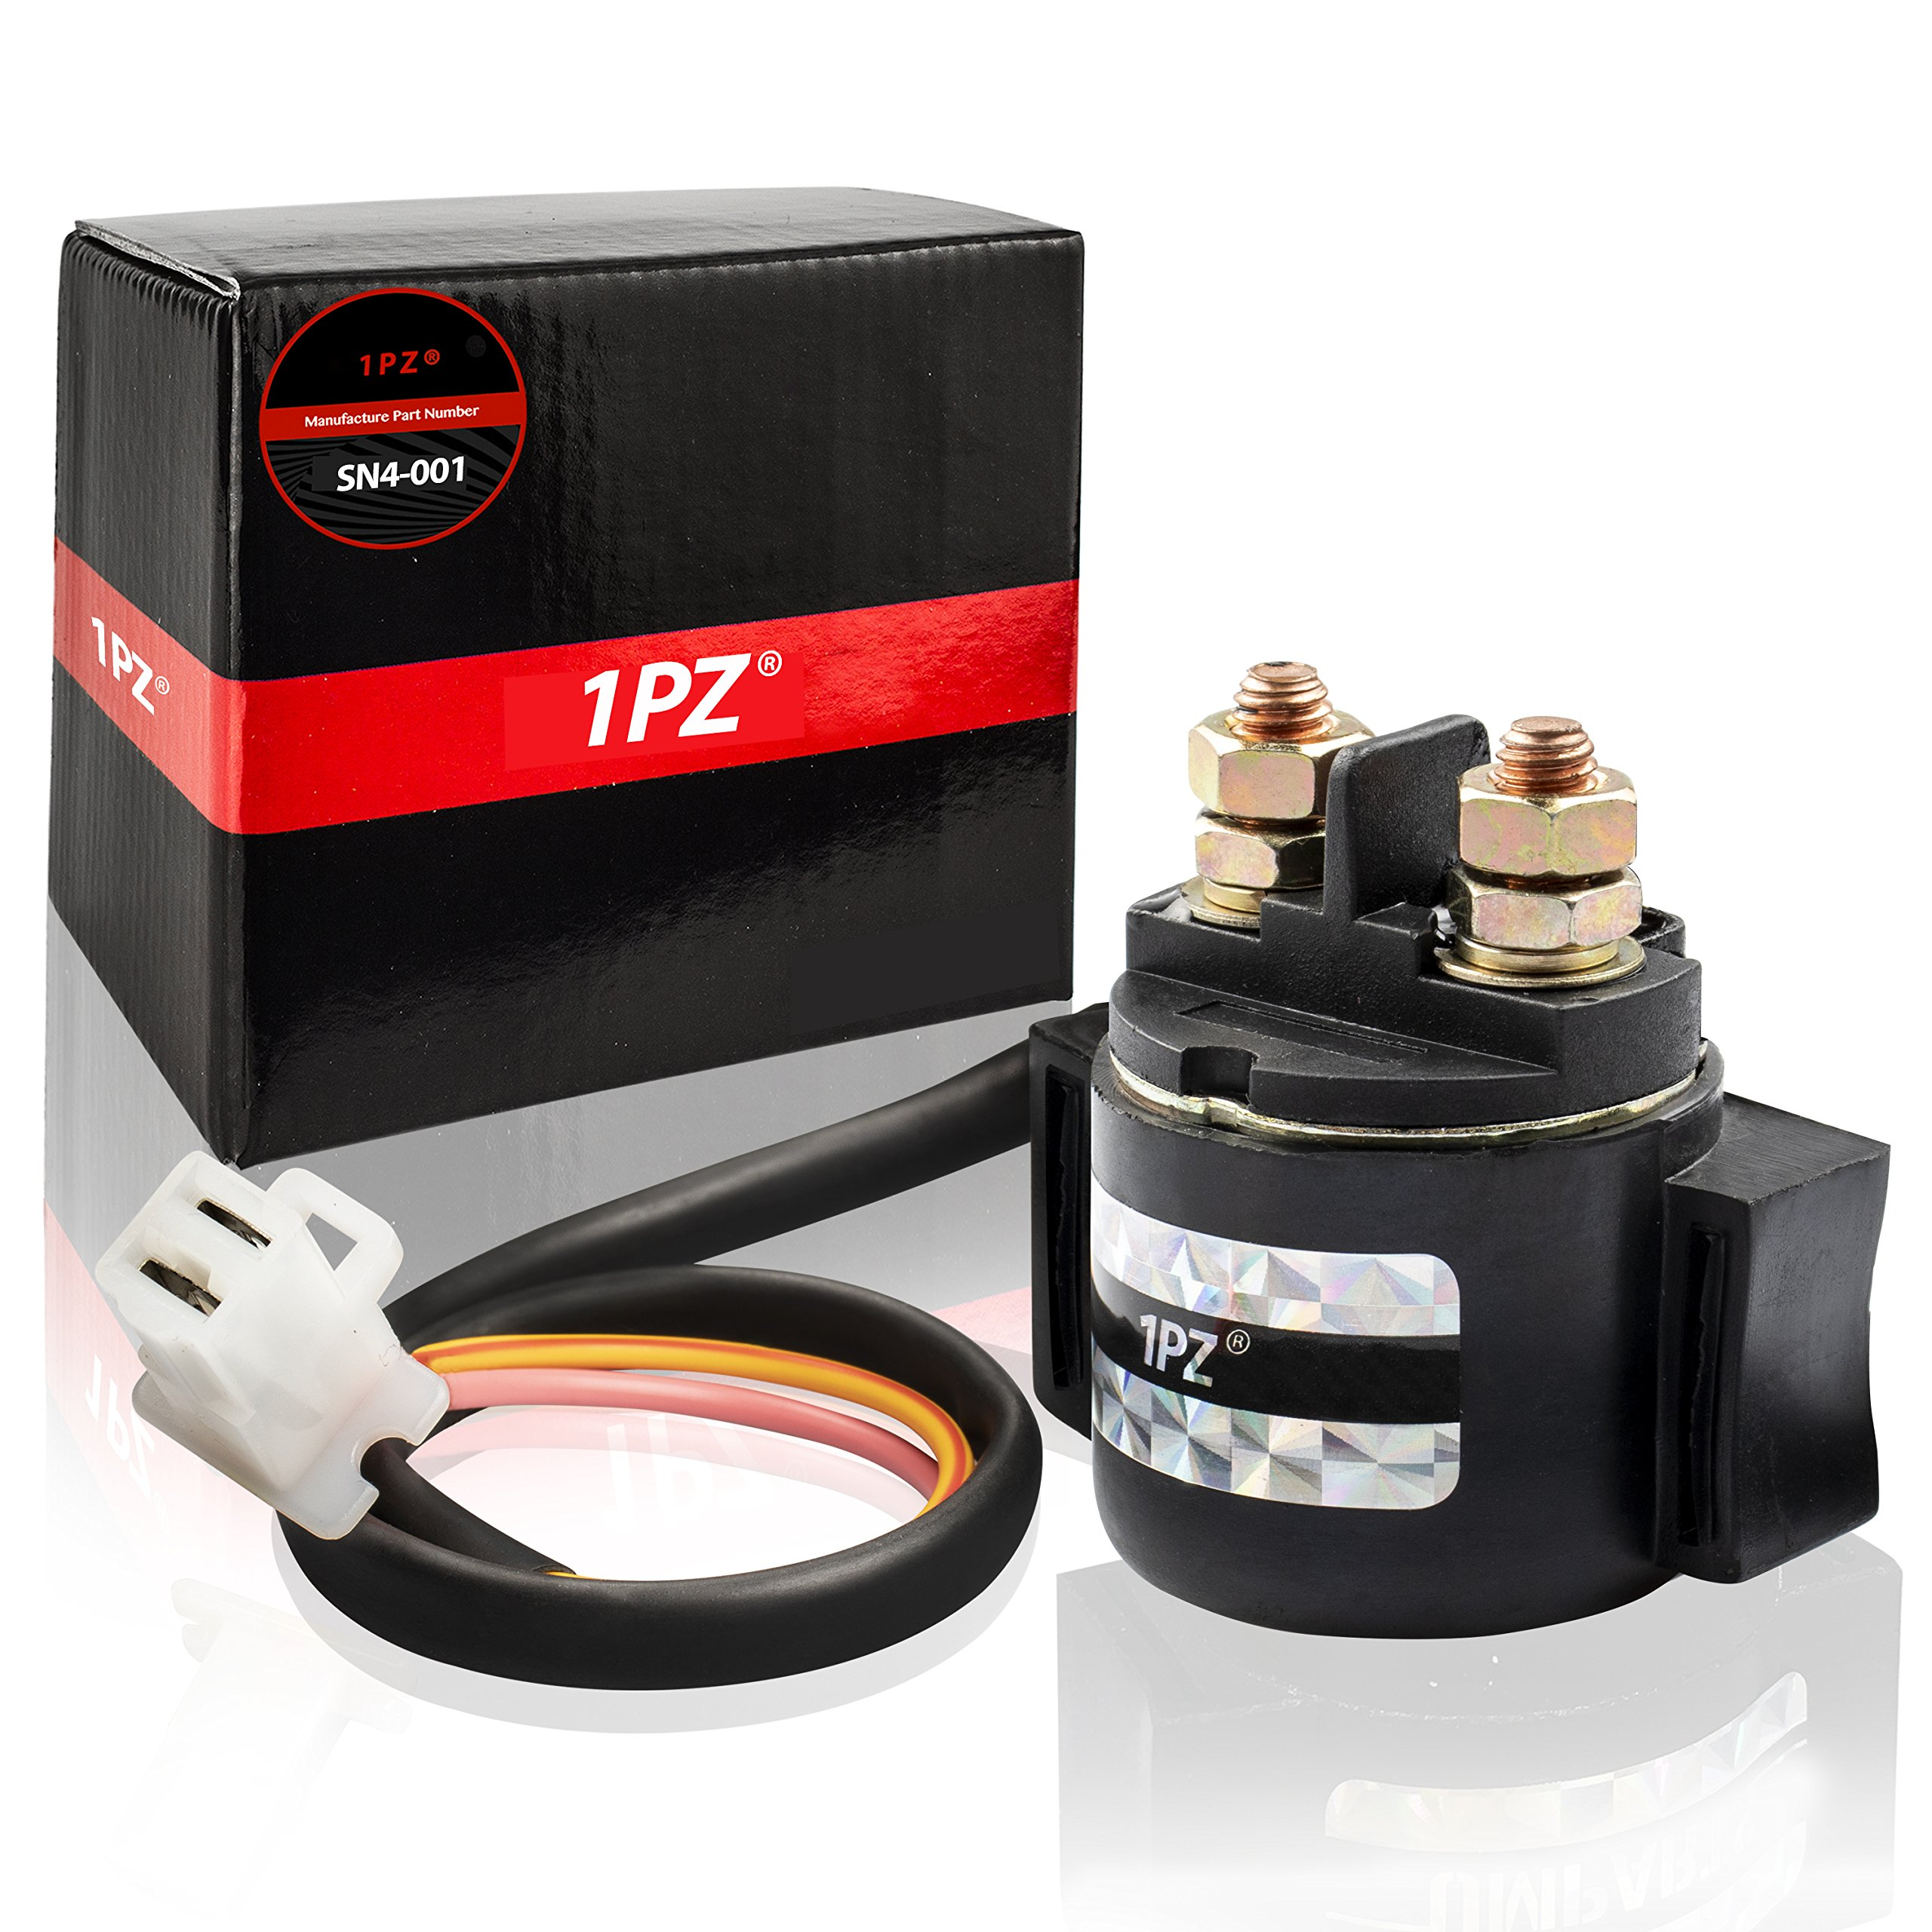 1PZ SN4-001 Starter Solenoid Relay for Honda 300 Fourtrax TRX300 TRX300FW 2X4 4x4 1988 1989 1990 1991 1992 1993 1994 1995 1996 1997 1998 1999 2000 35850-HC4-000